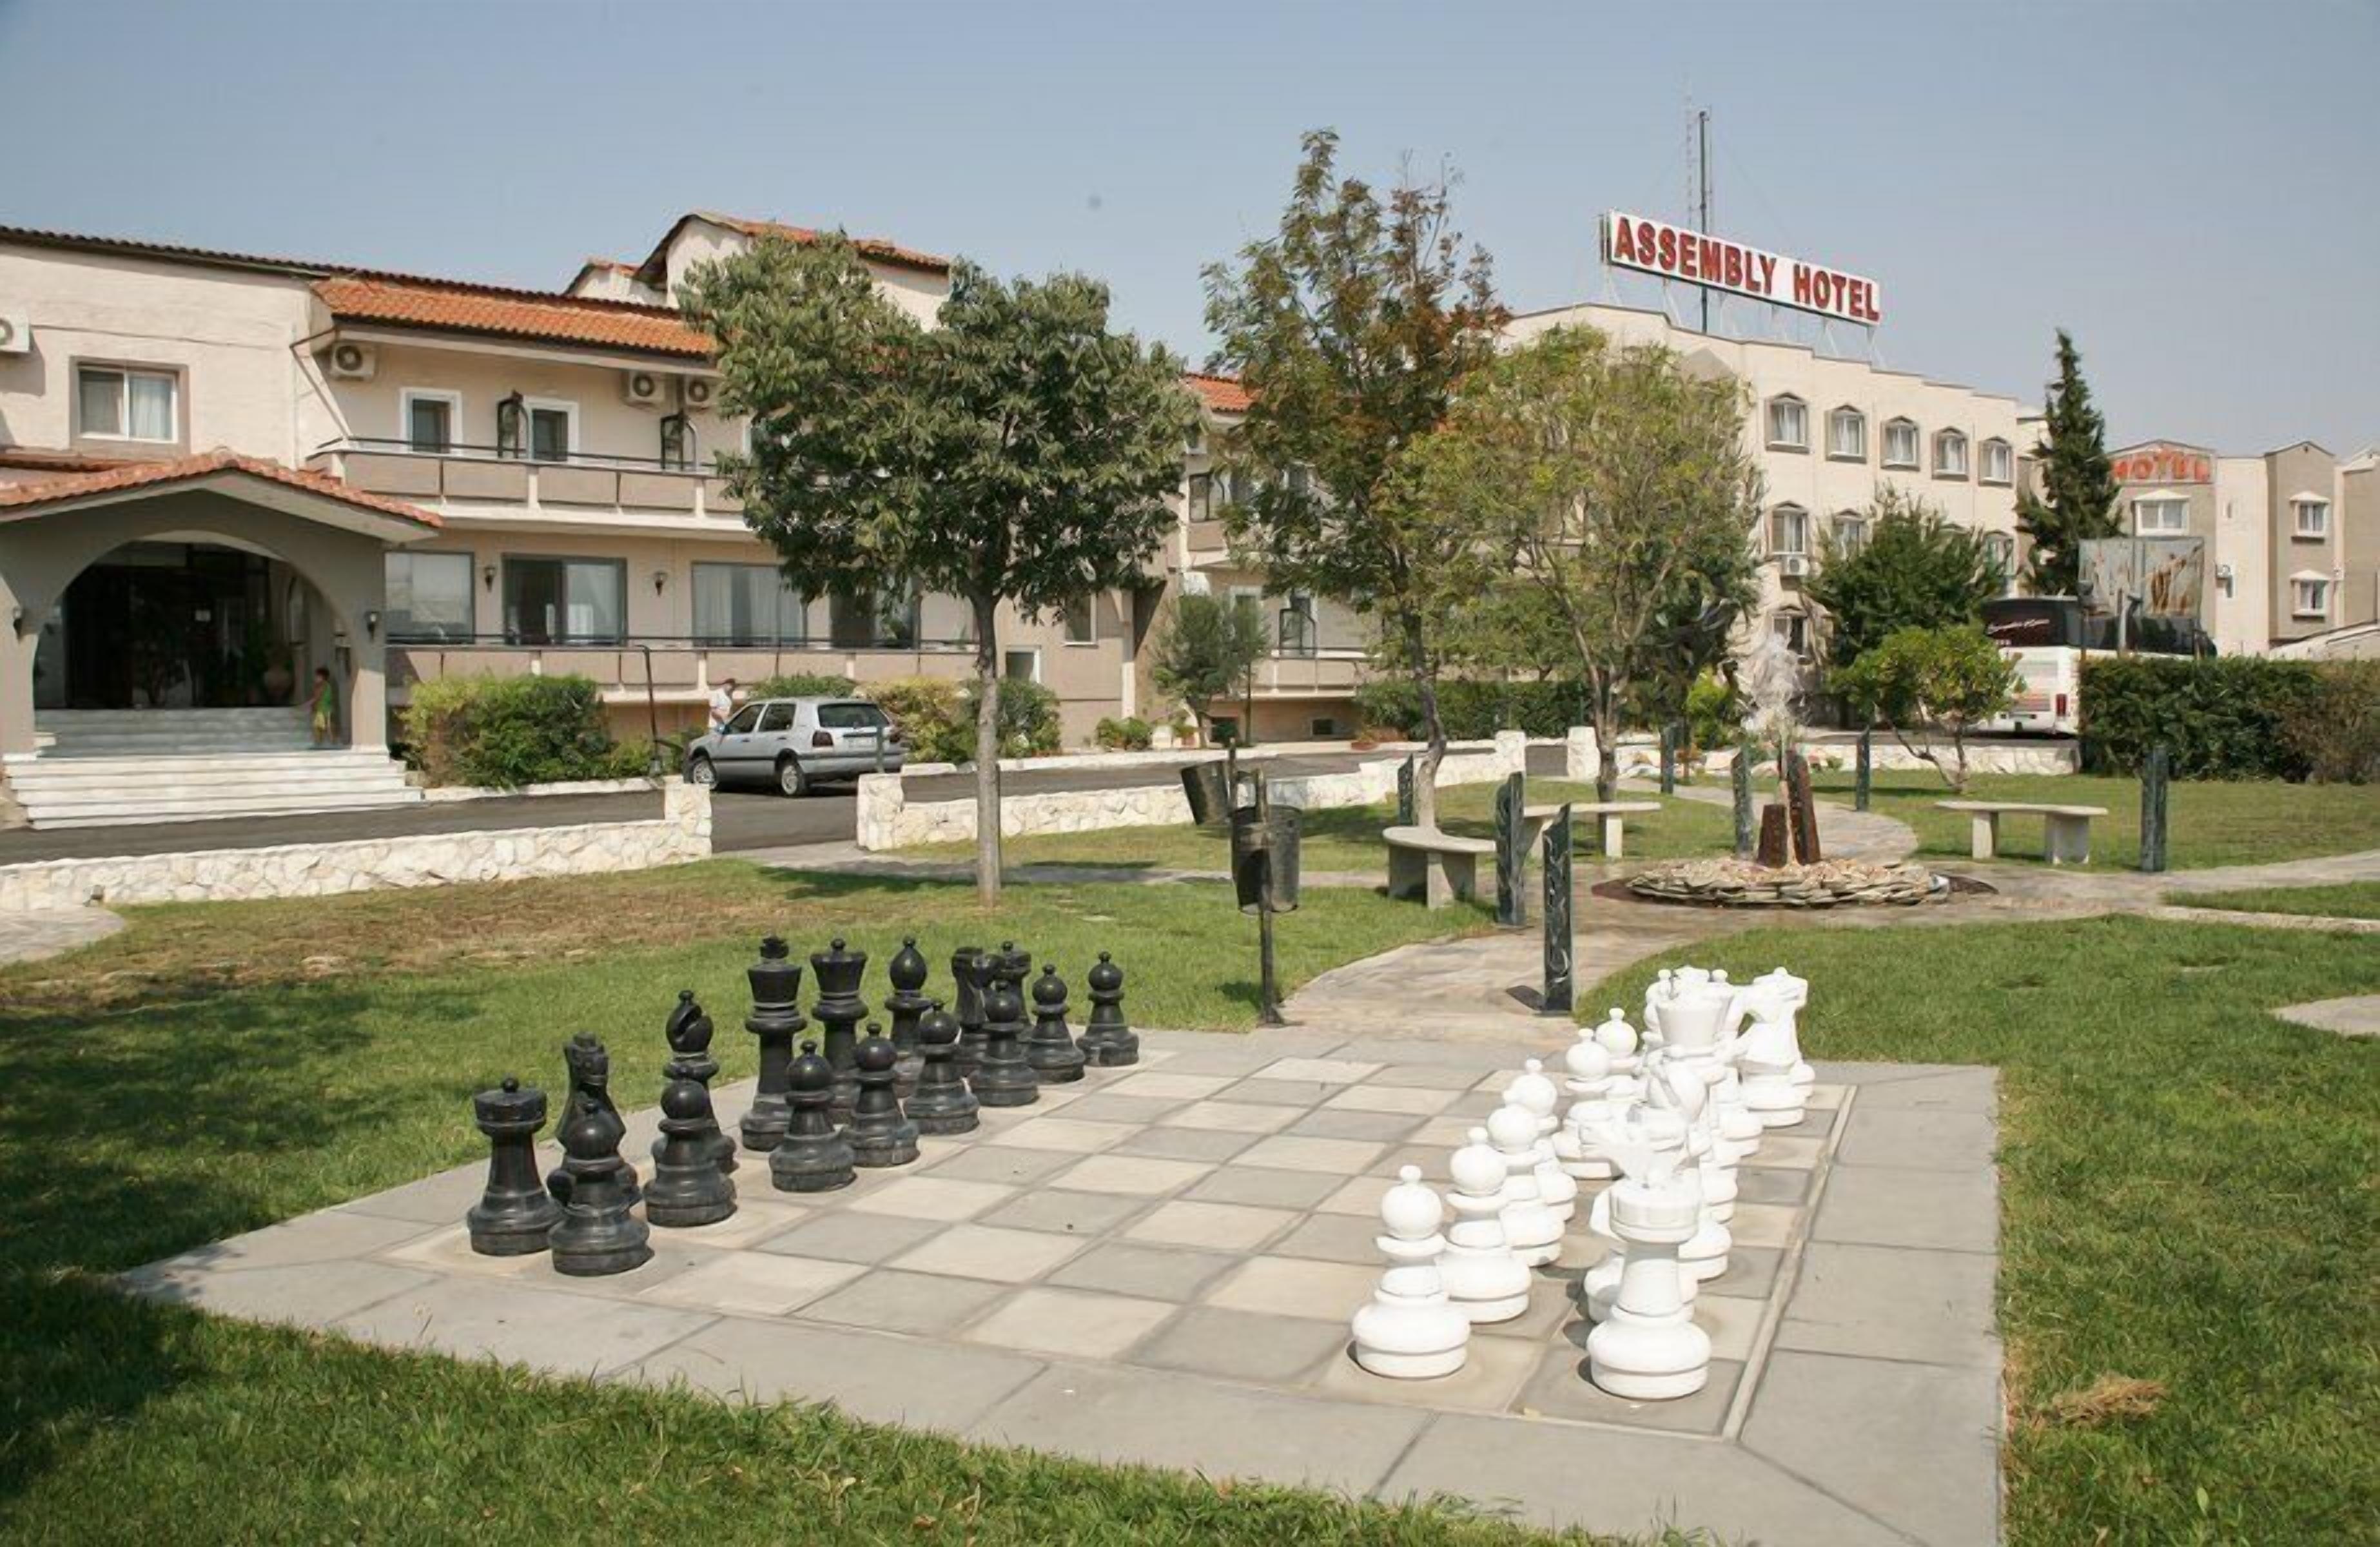 Assembly Hotel